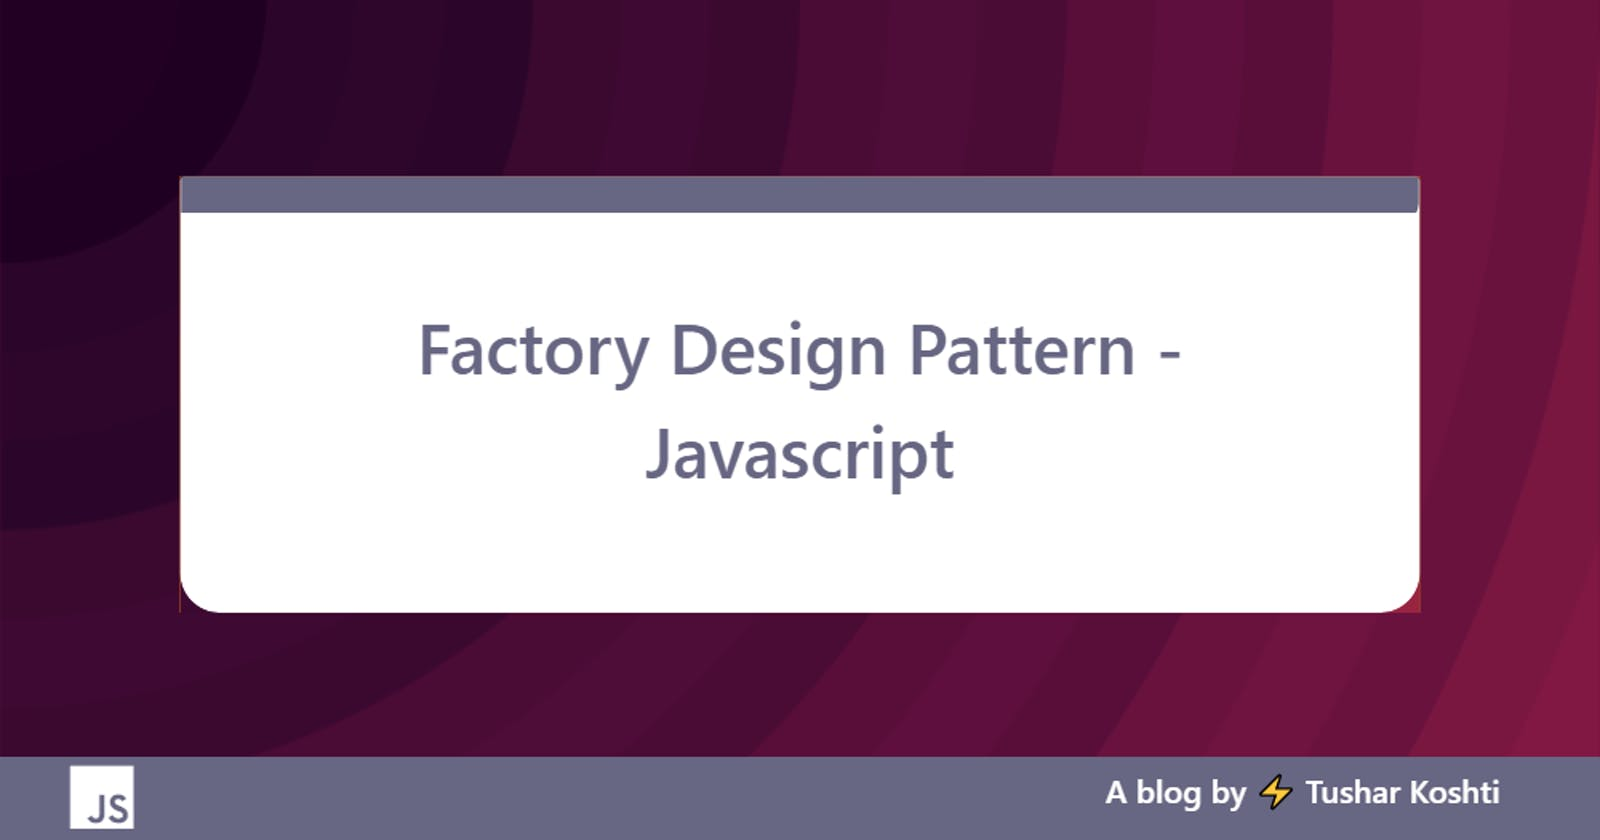 Factory Design Pattern - Javascript